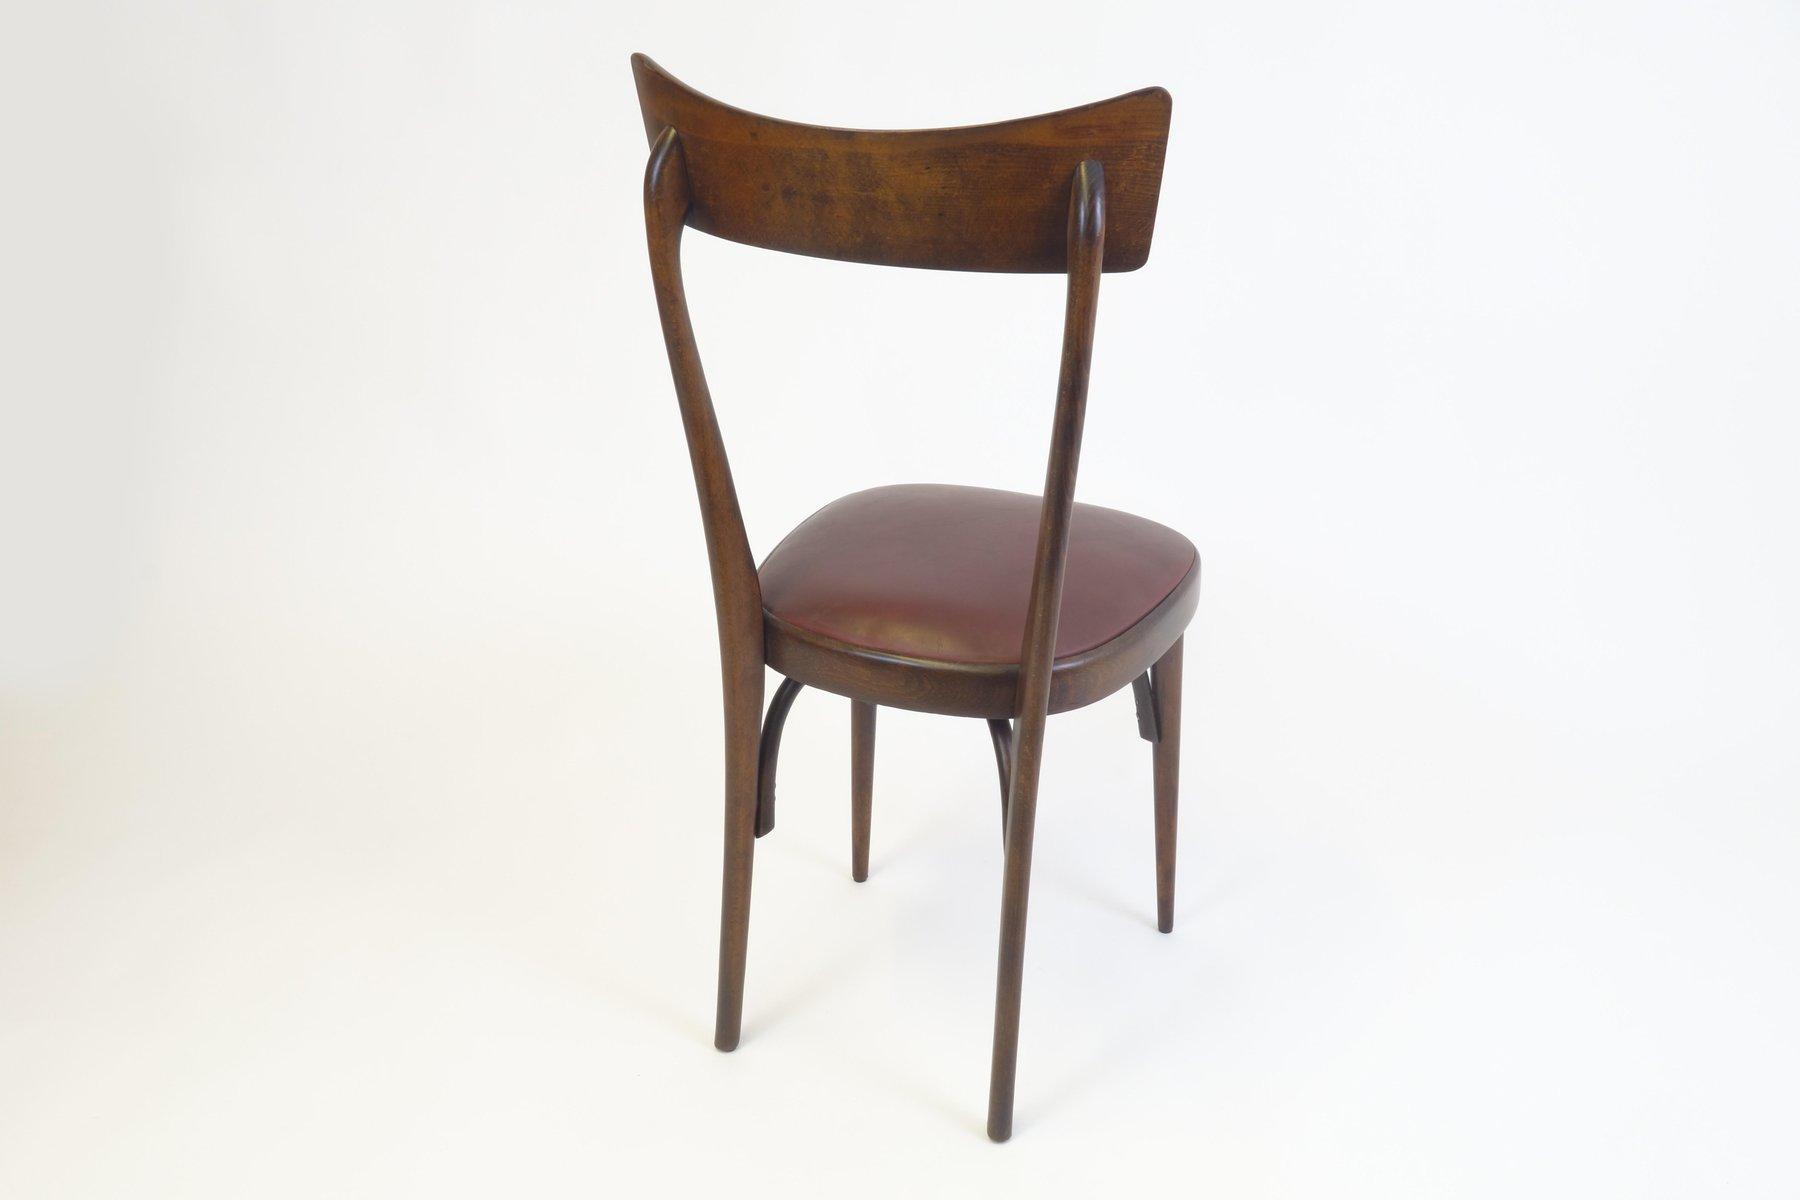 dining chairs set of 4. Mid-Century Italian Mahogany Dining Chairs, Set Of 4 Chairs